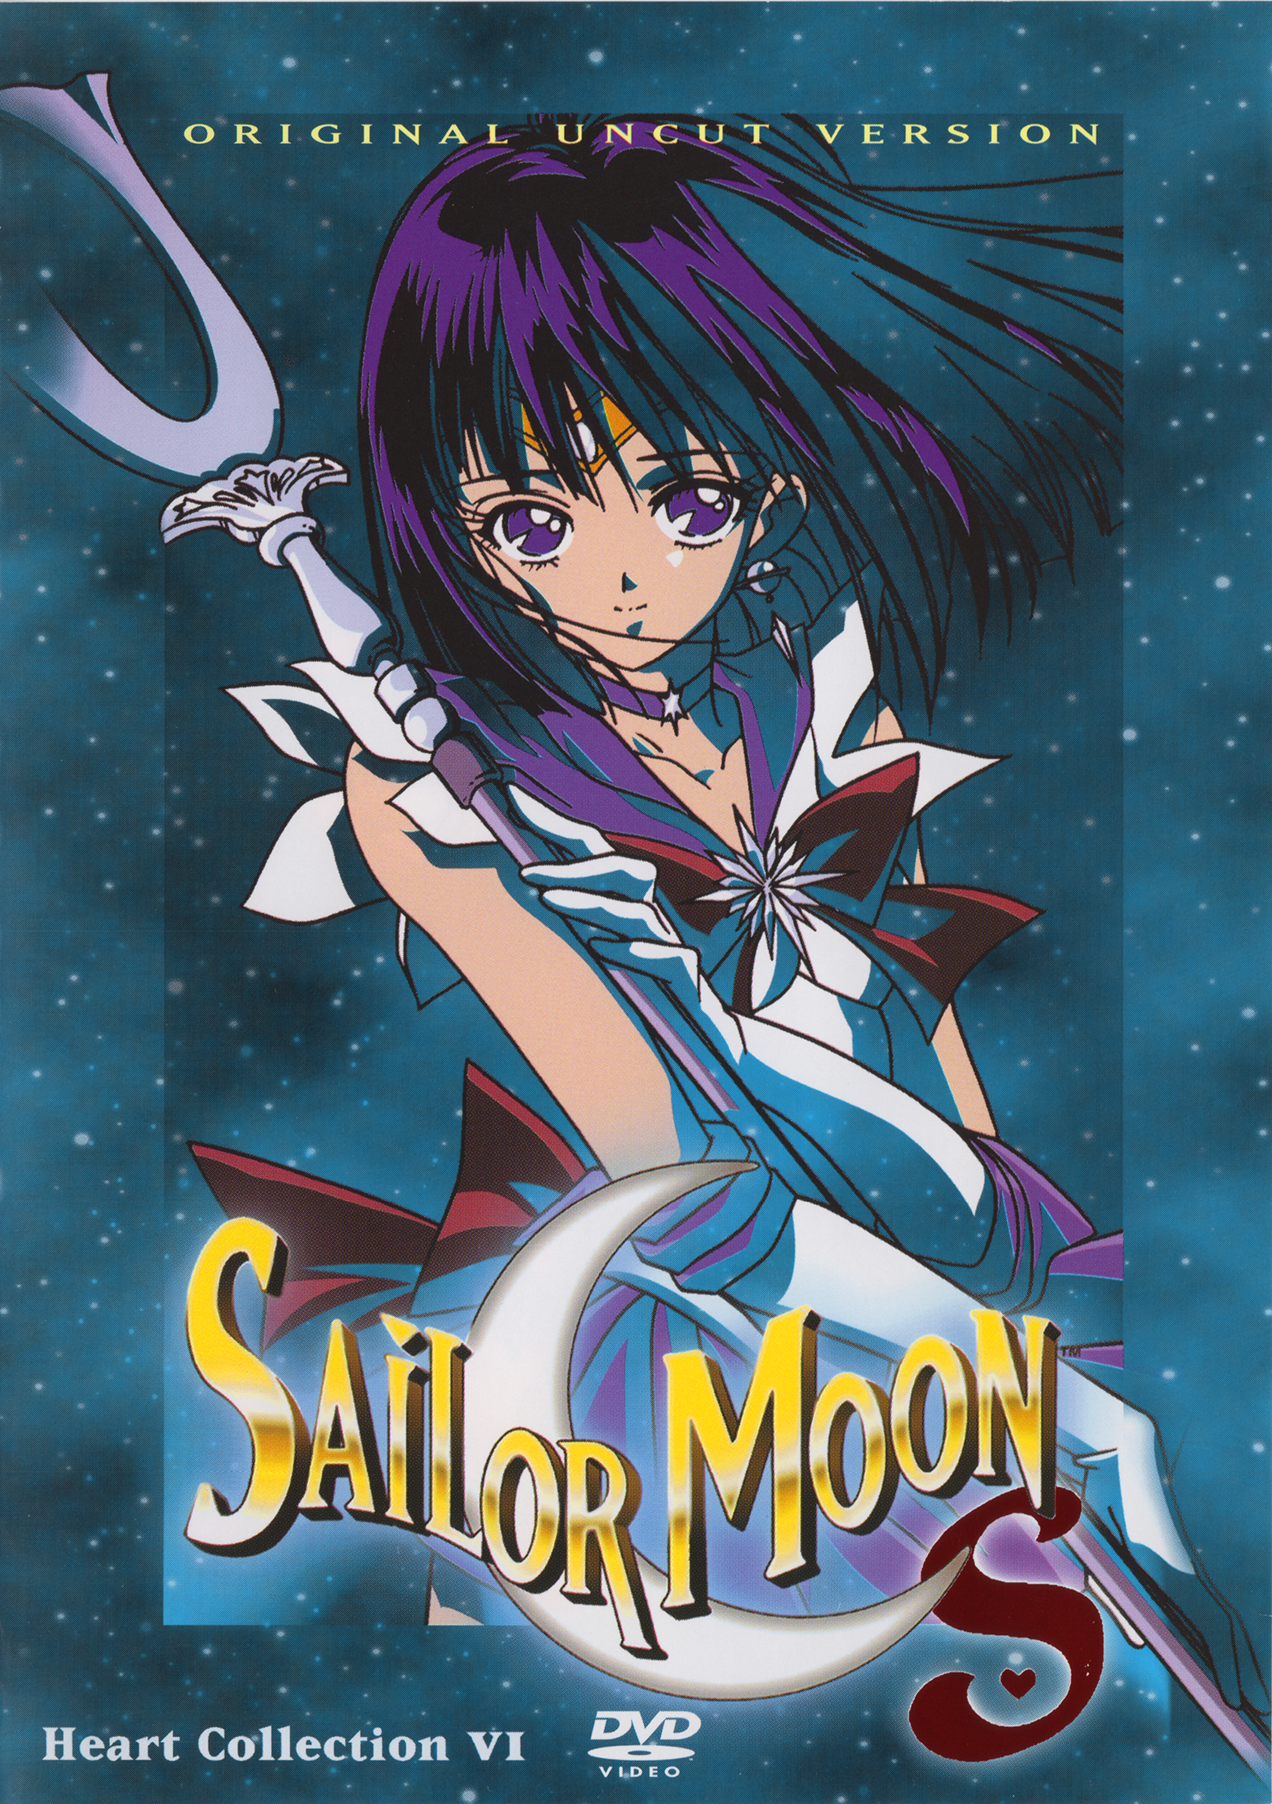 Sailor Moon S - Heart Collection VI